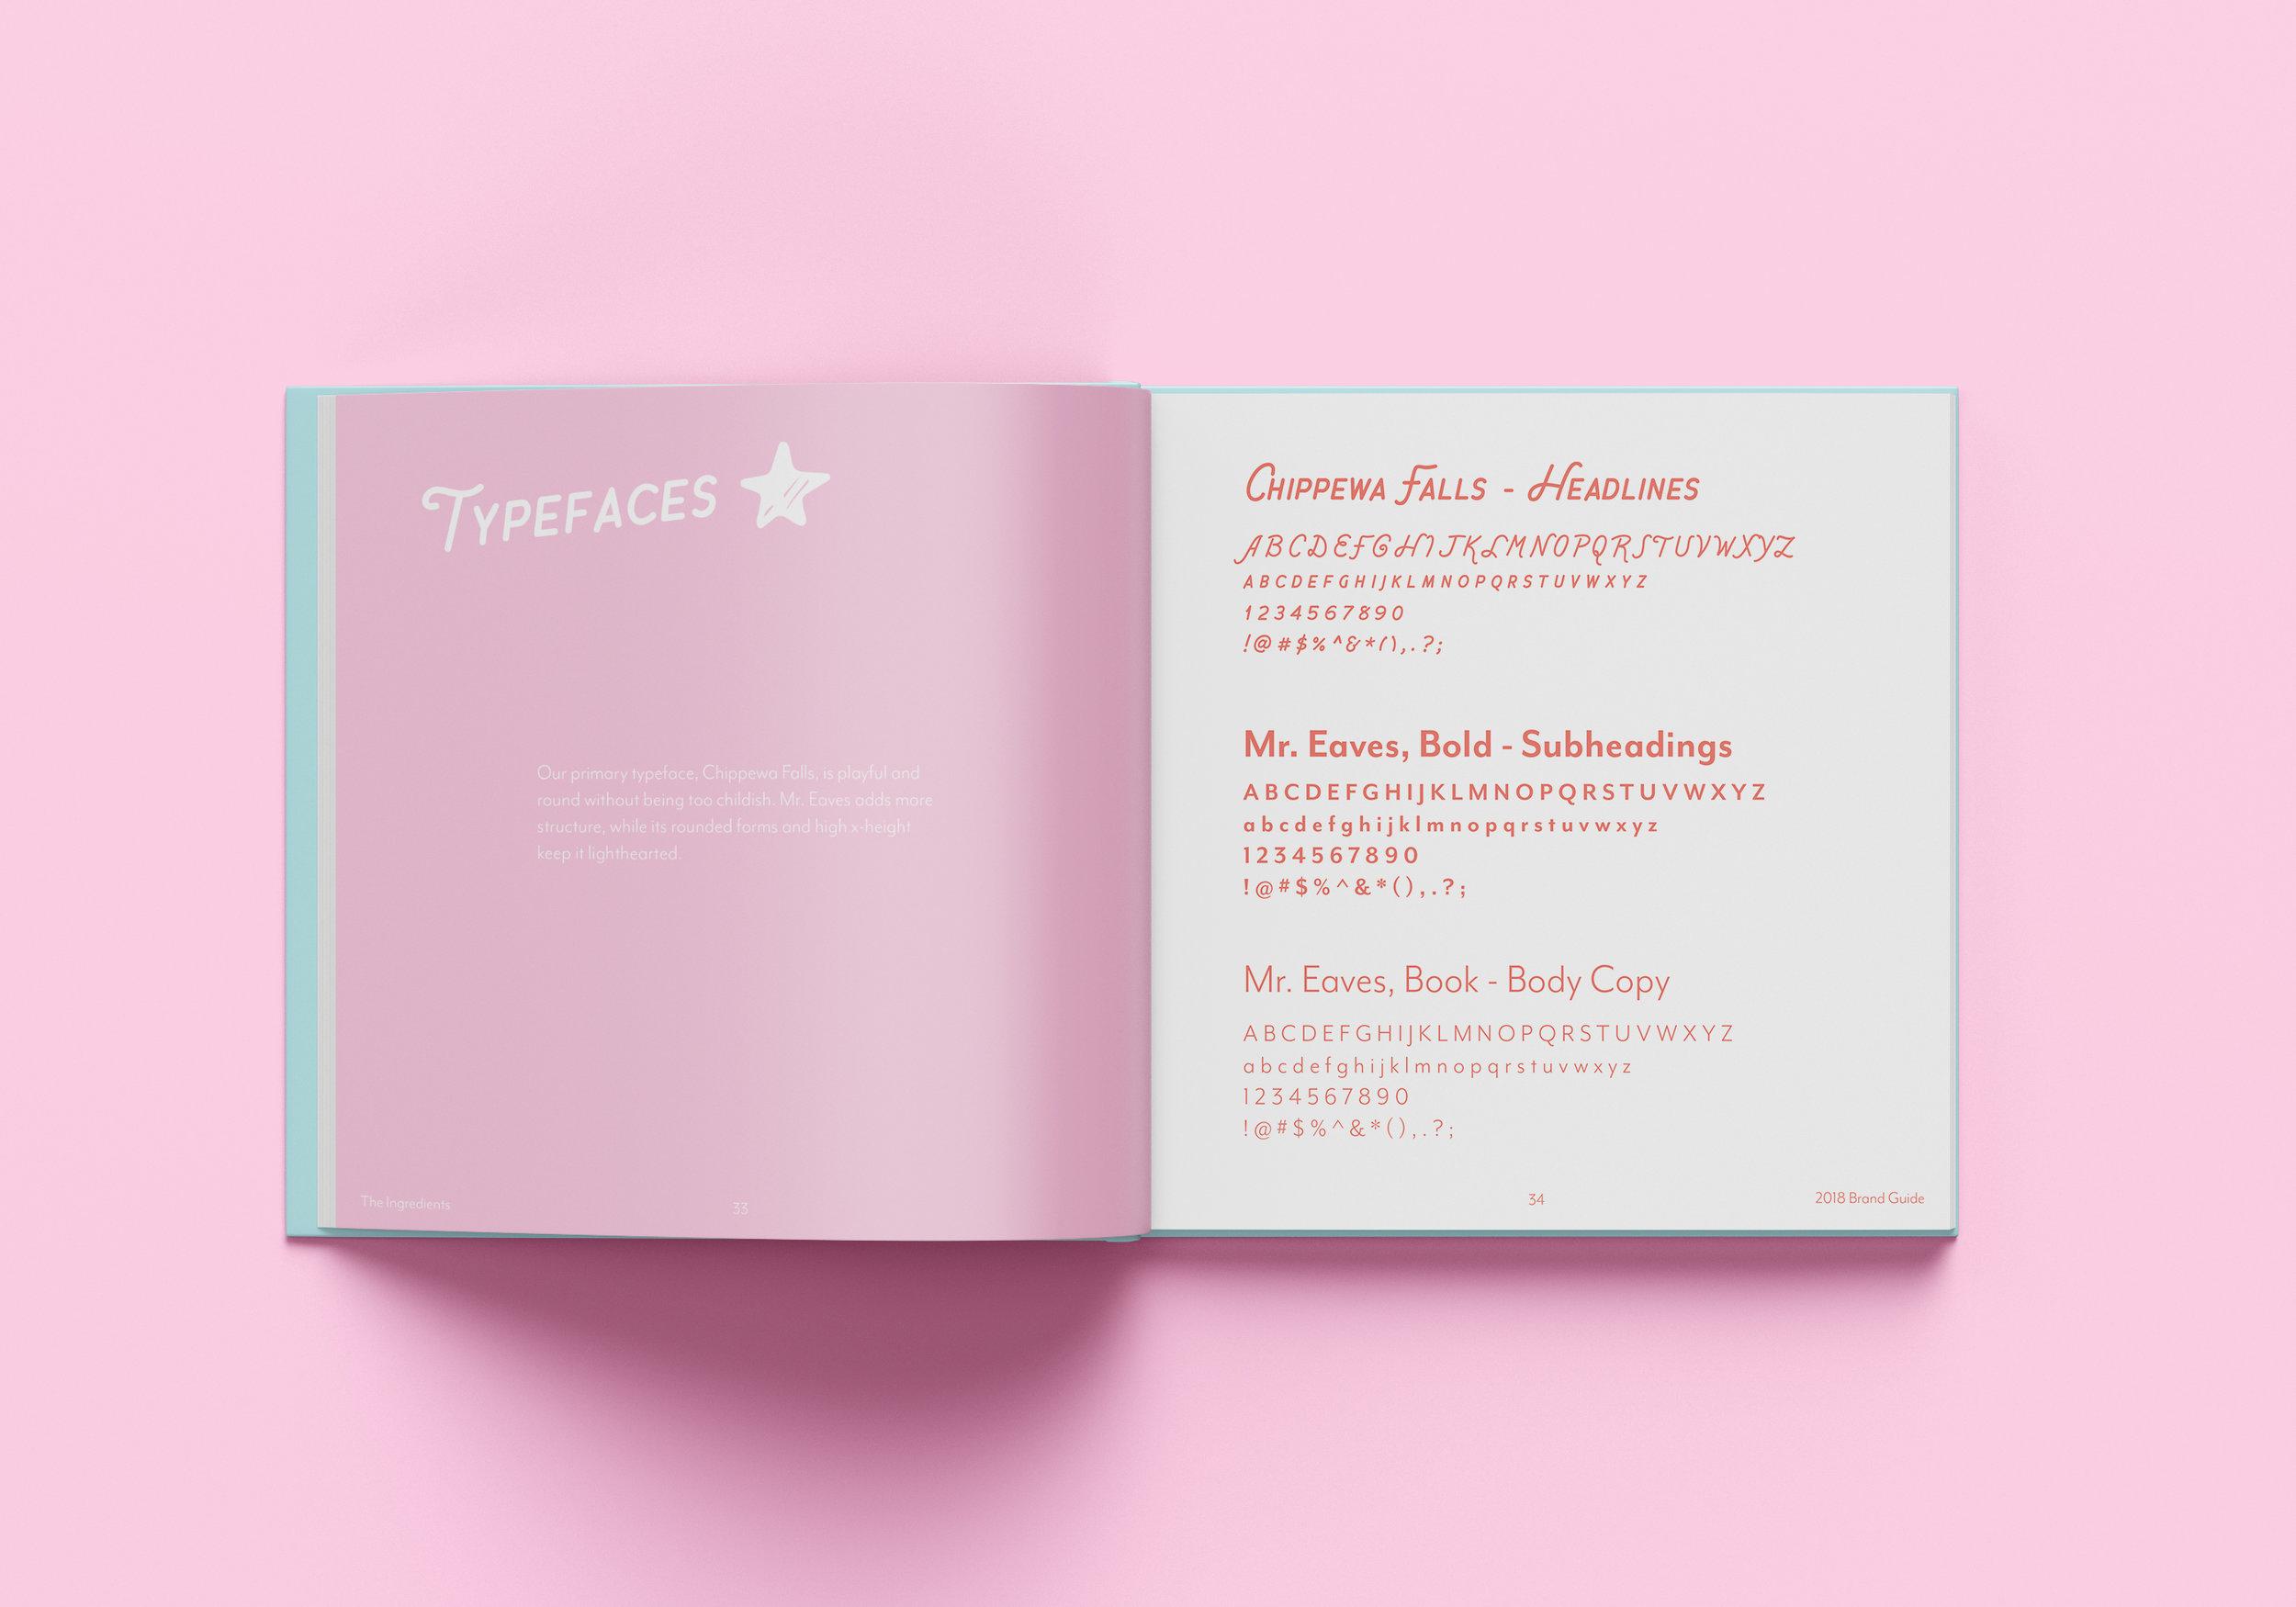 Typefaces.jpg